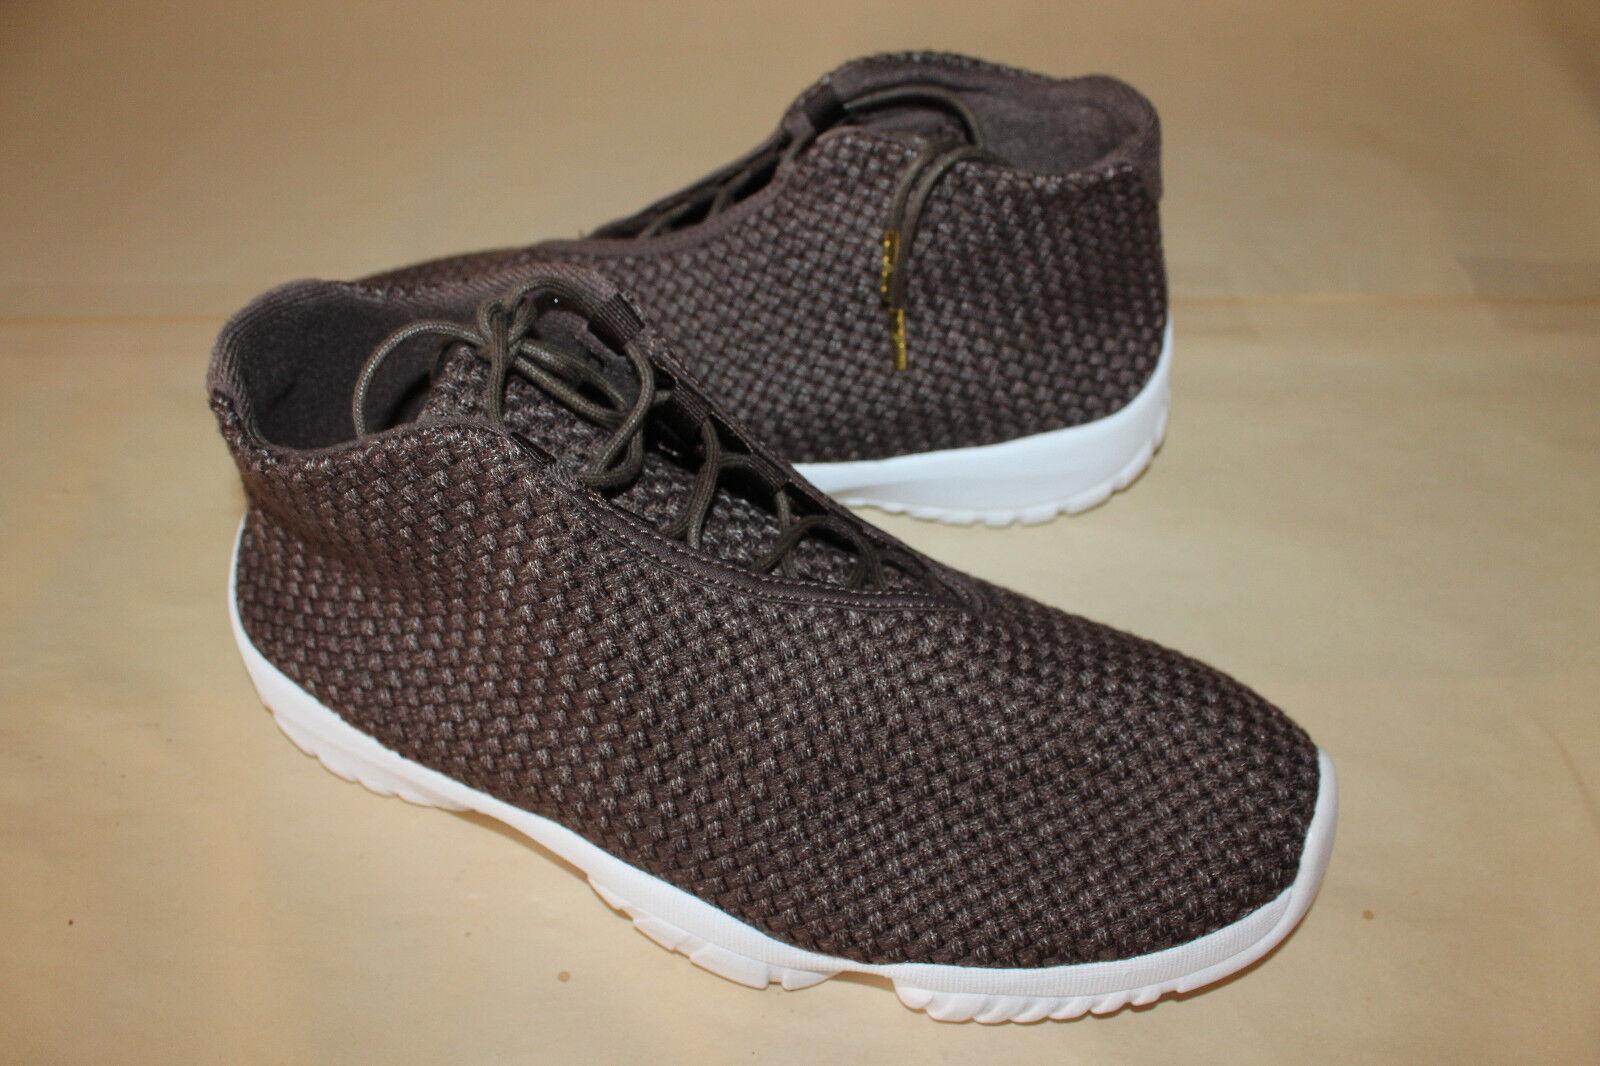 Nike Air Jordan Future Baroque Brown White 656503-2018 Men's Casual Shoe Sz 11 Seasonal clearance sale